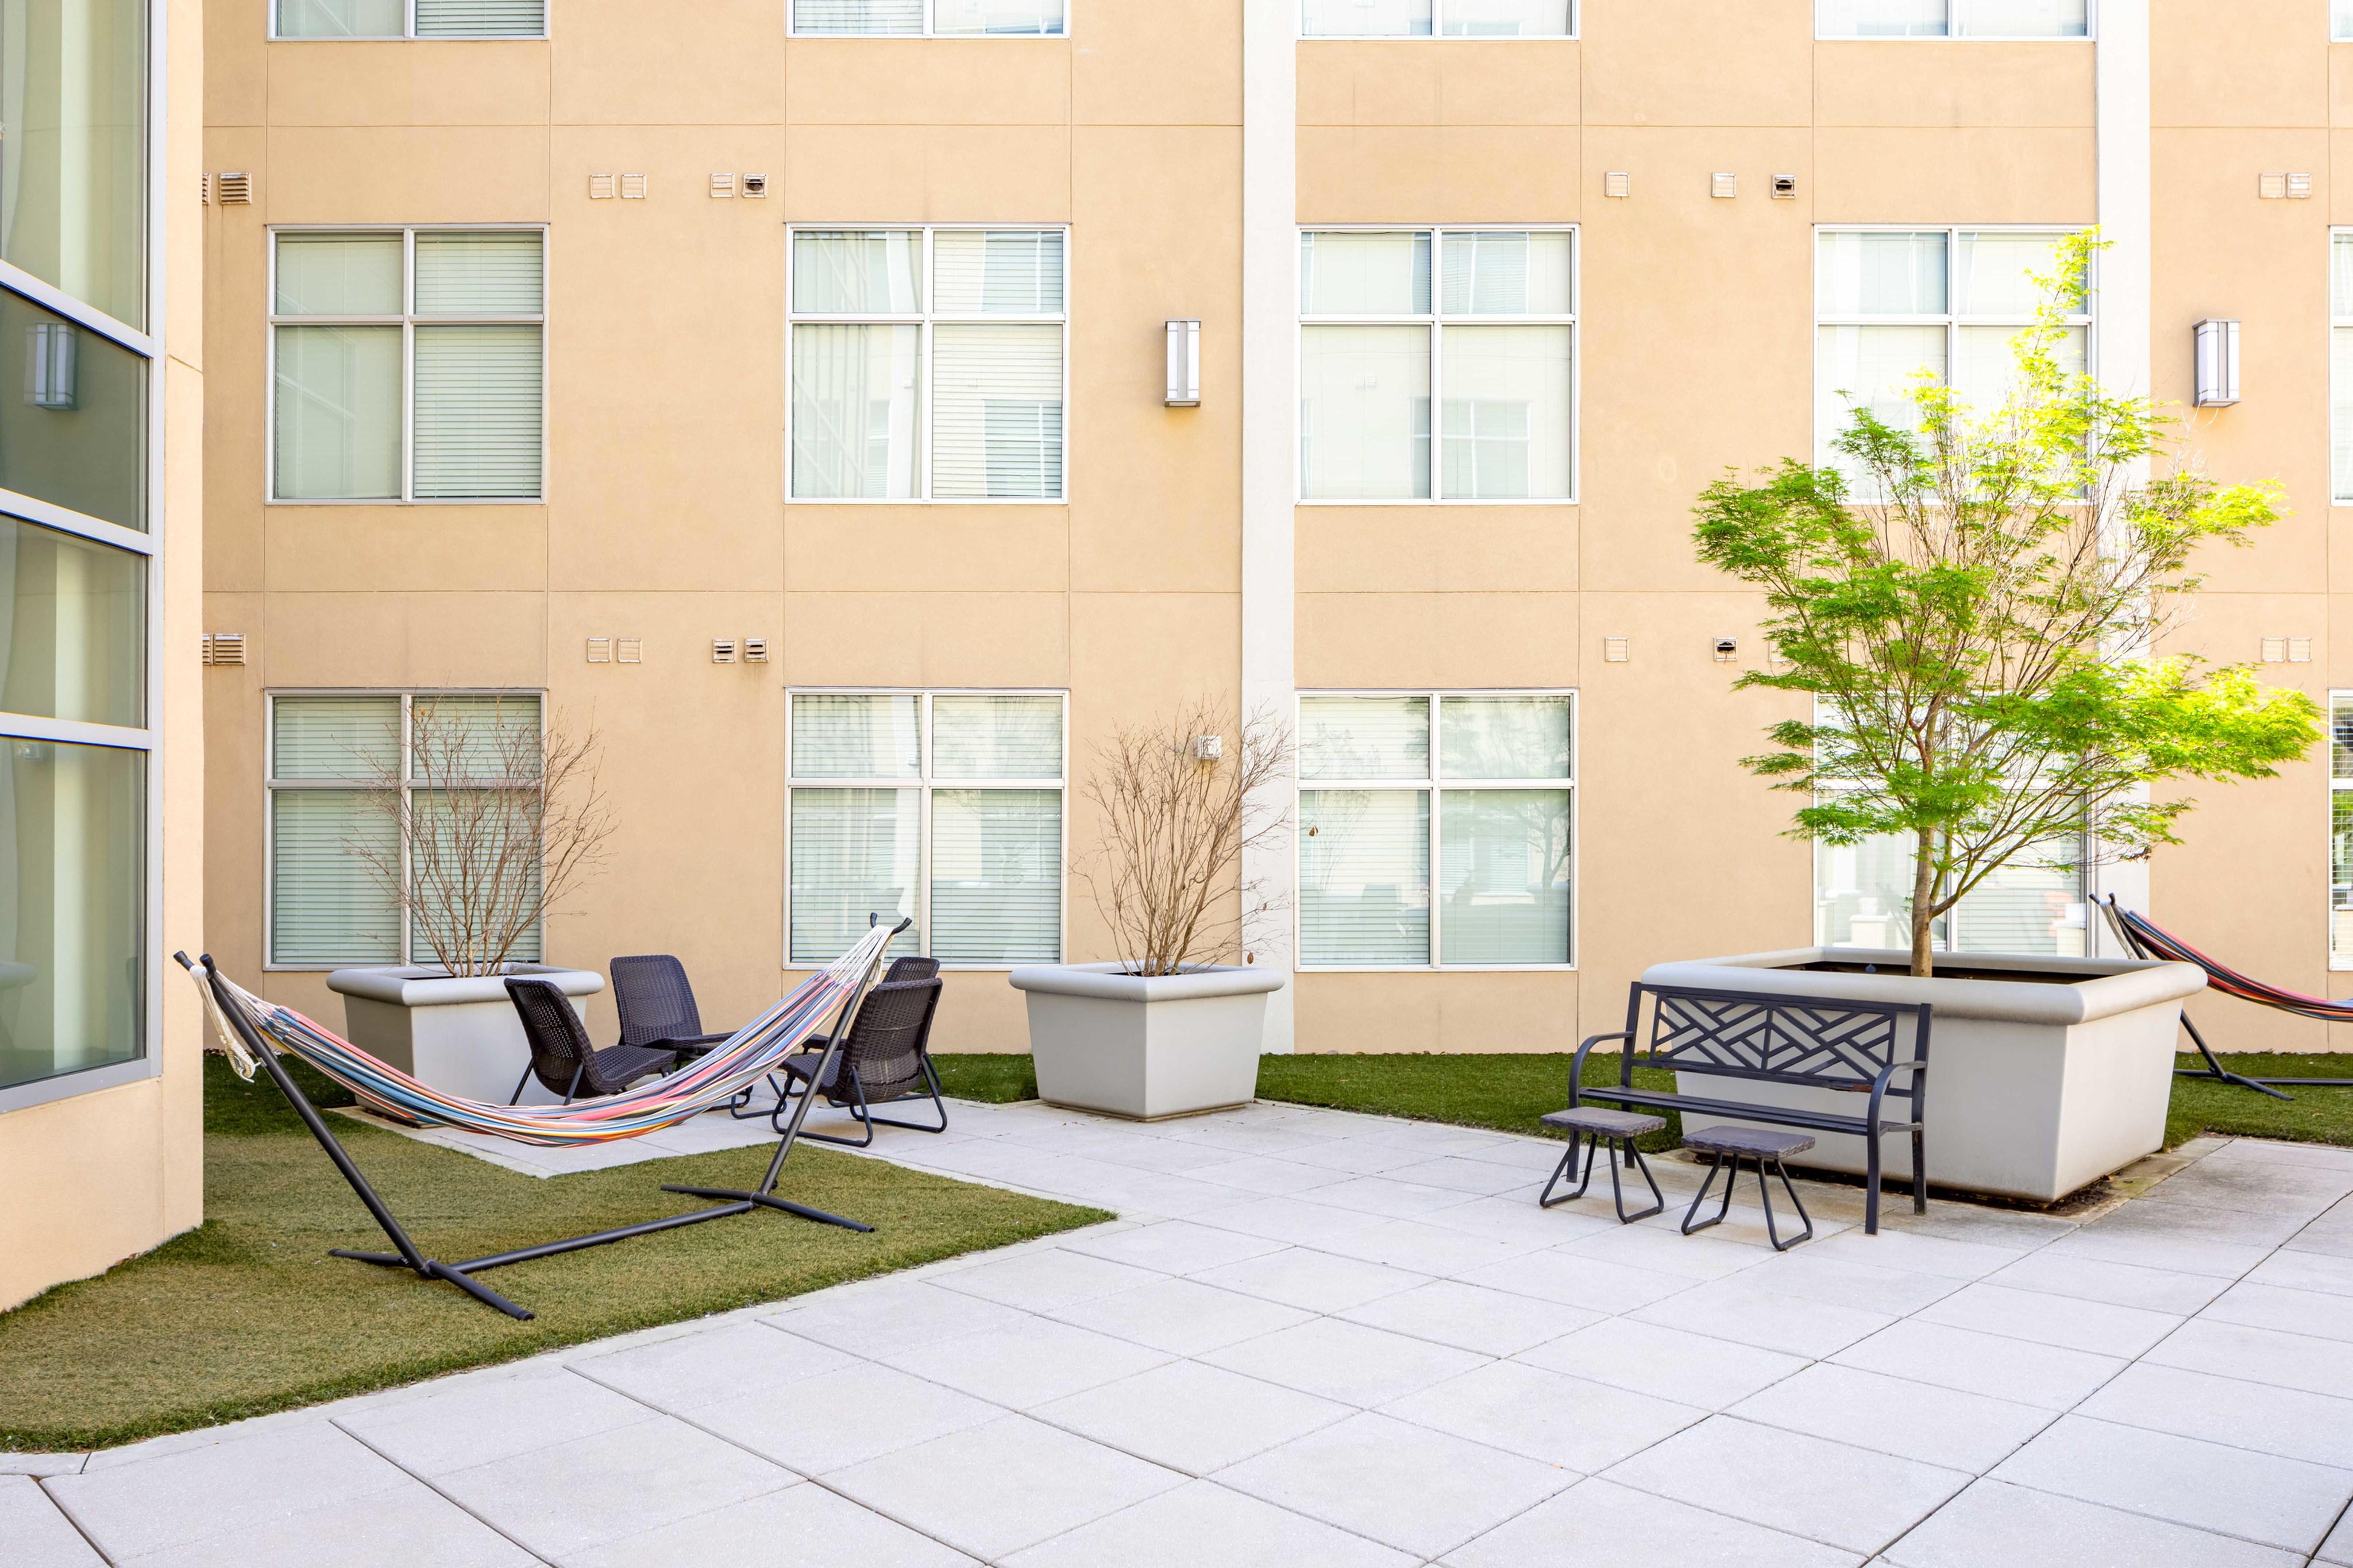 Courtyard with Hammocks